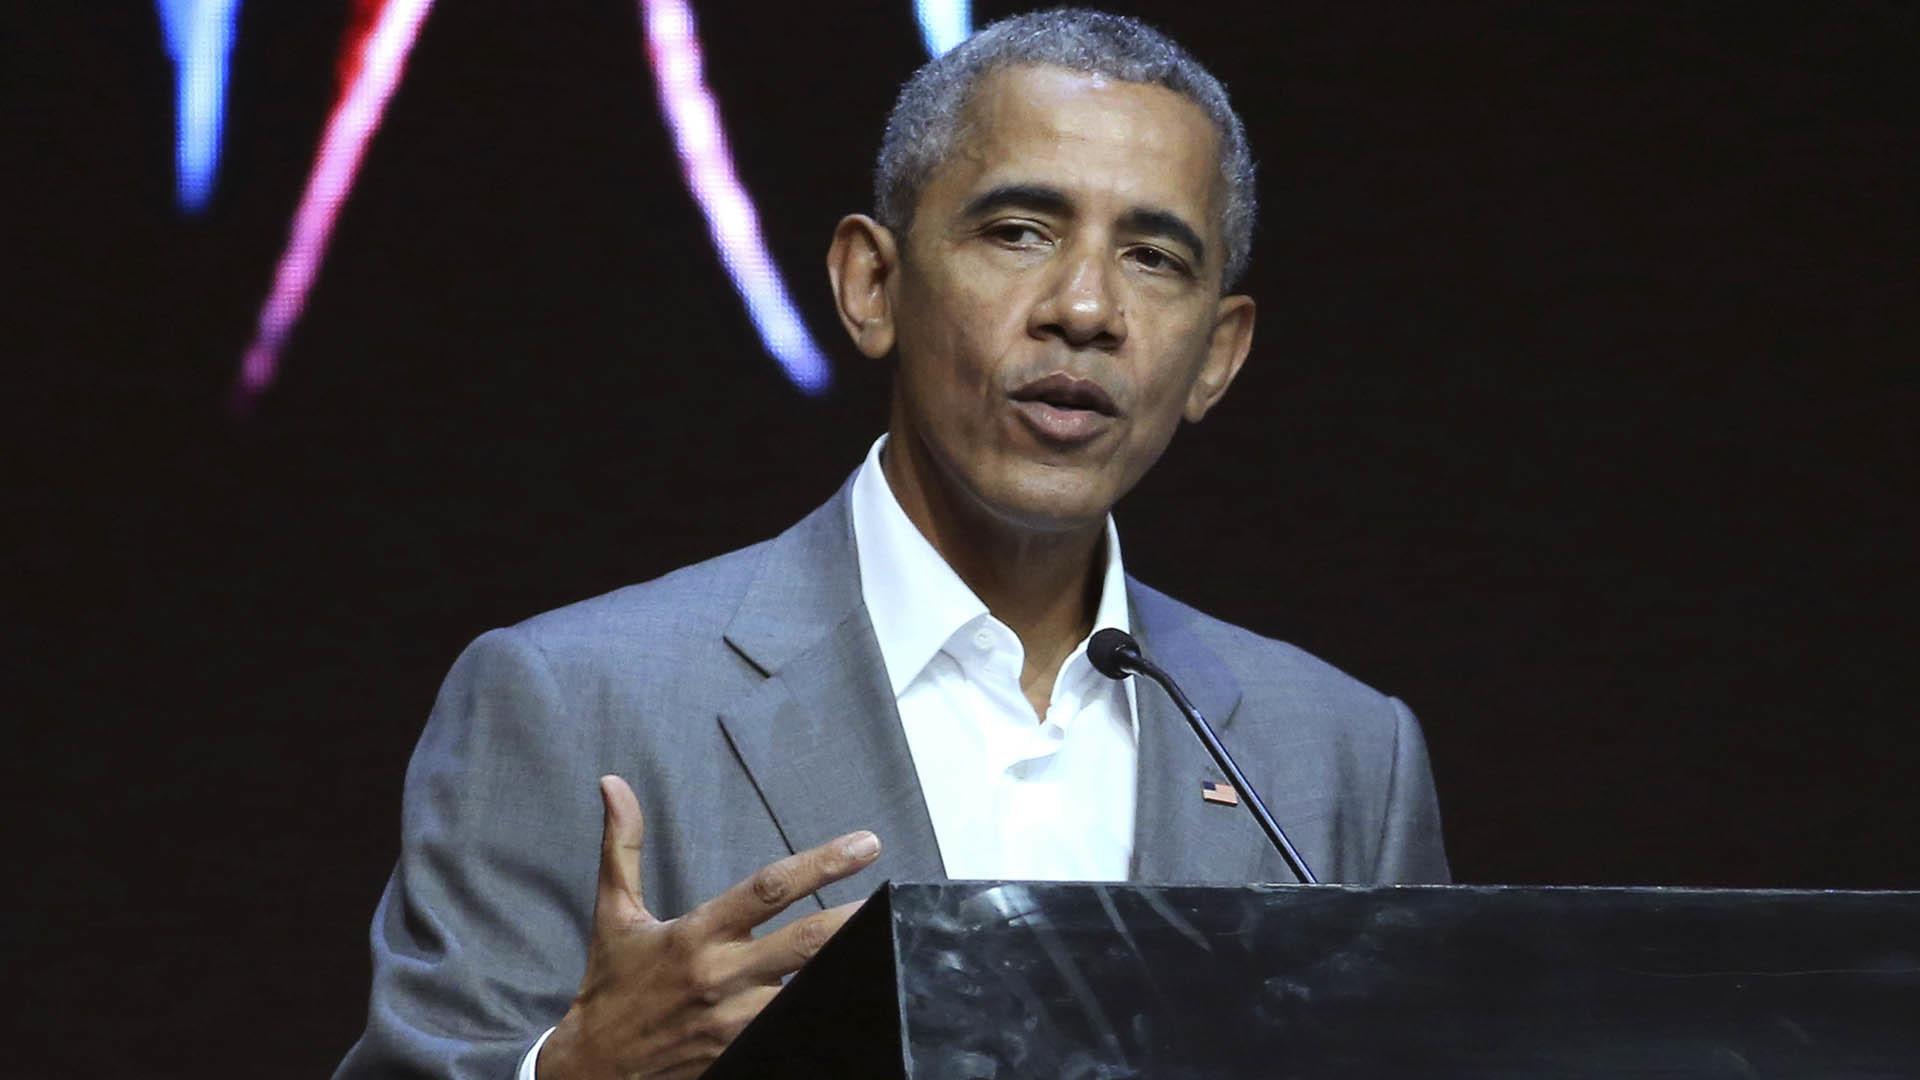 Barack Obama and the rhetoric of a black president